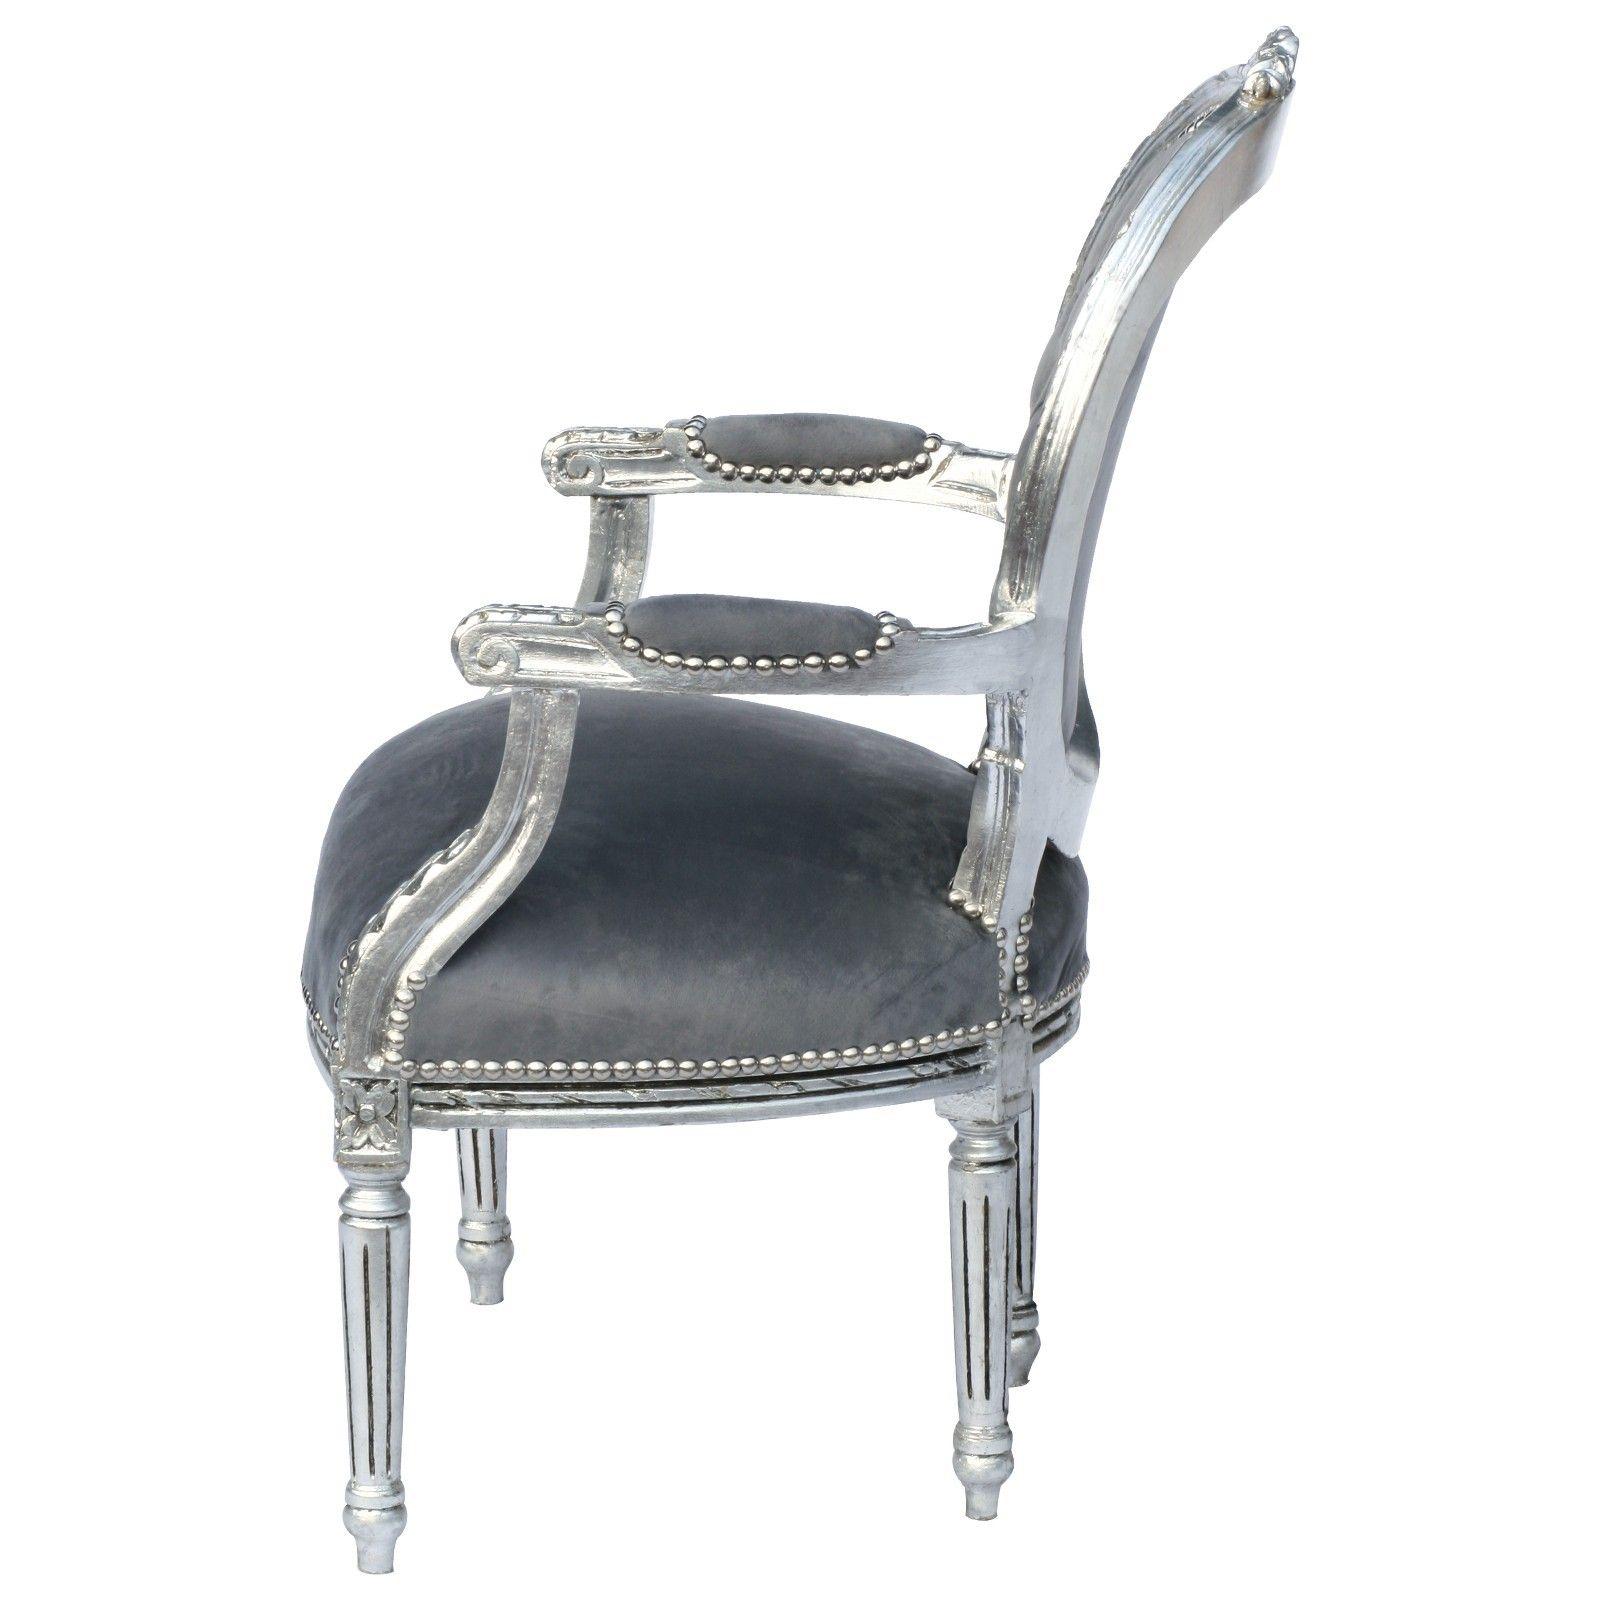 Dining Stuhl Mit Armlehne Stuhlede Com Stuhl Mit Armlehne Stuhle Barock